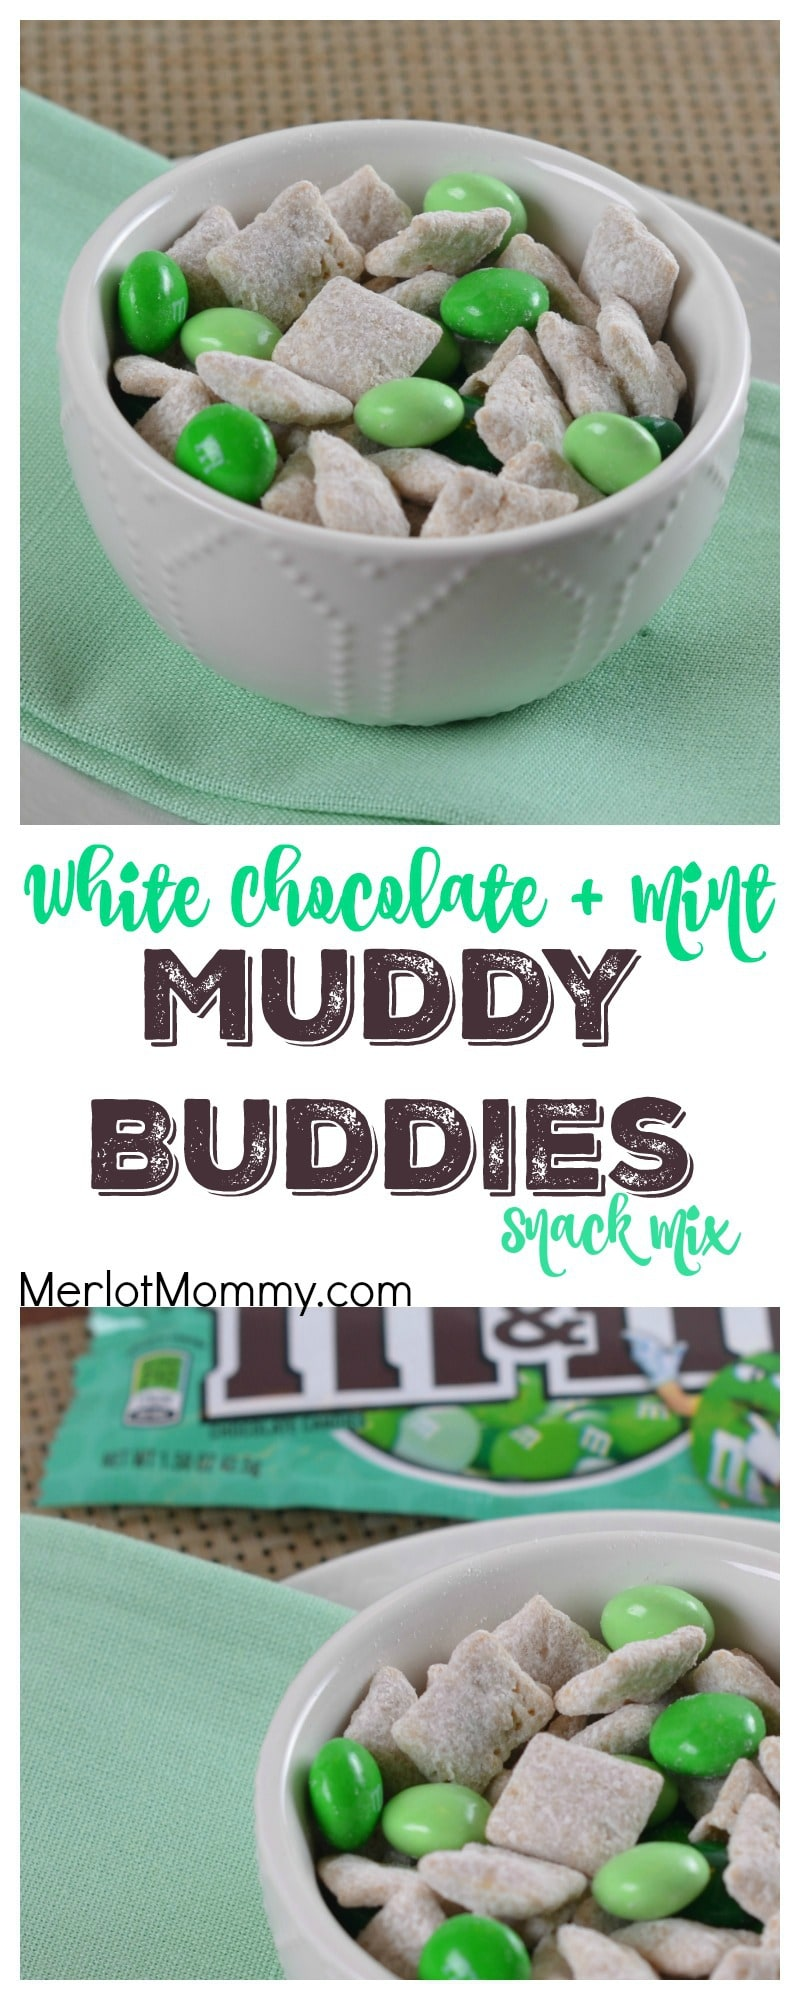 White Chocolate + Mint Muddy Buddies Snack Mix | Whisky ...